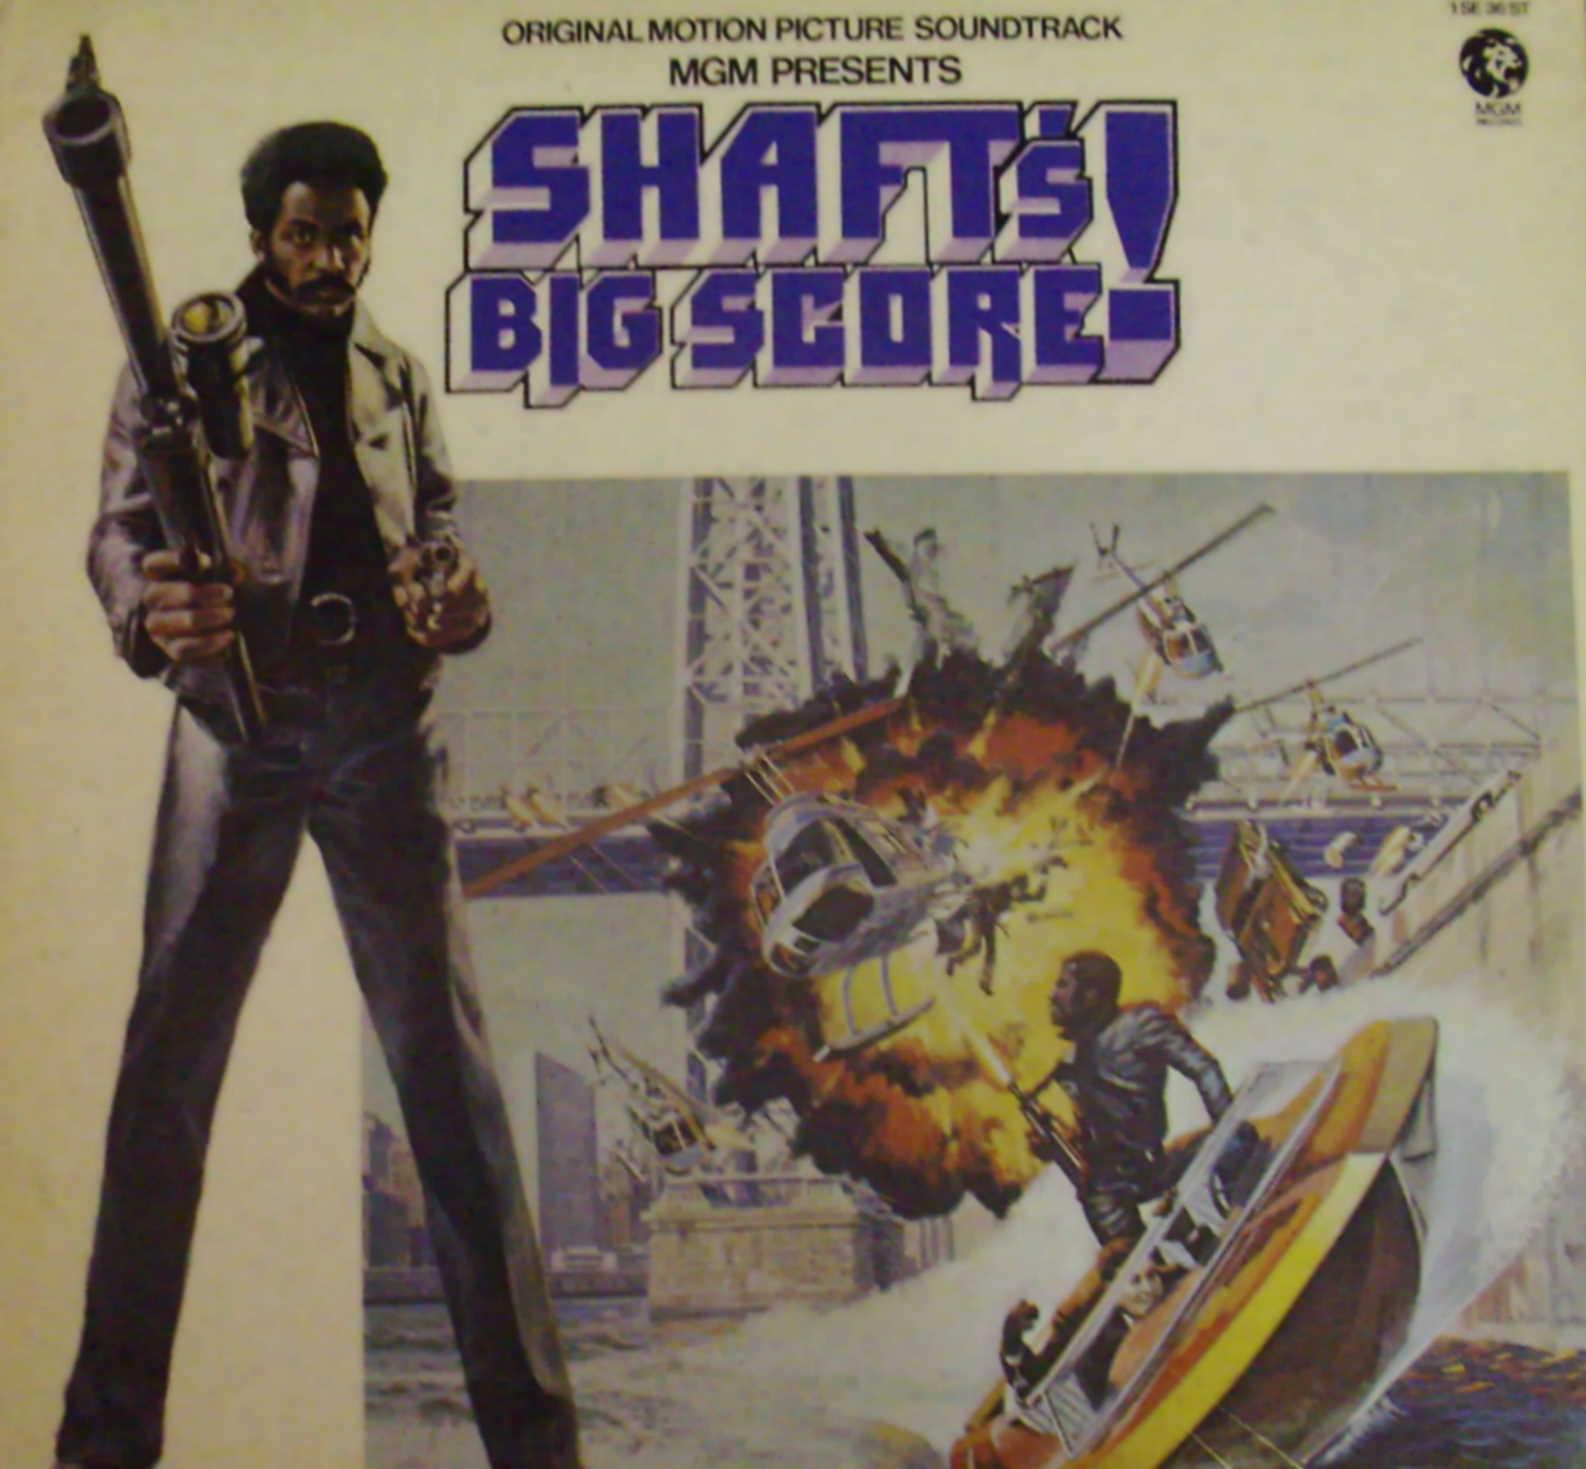 Shaft's Big Score! / Shaft's Big Score!